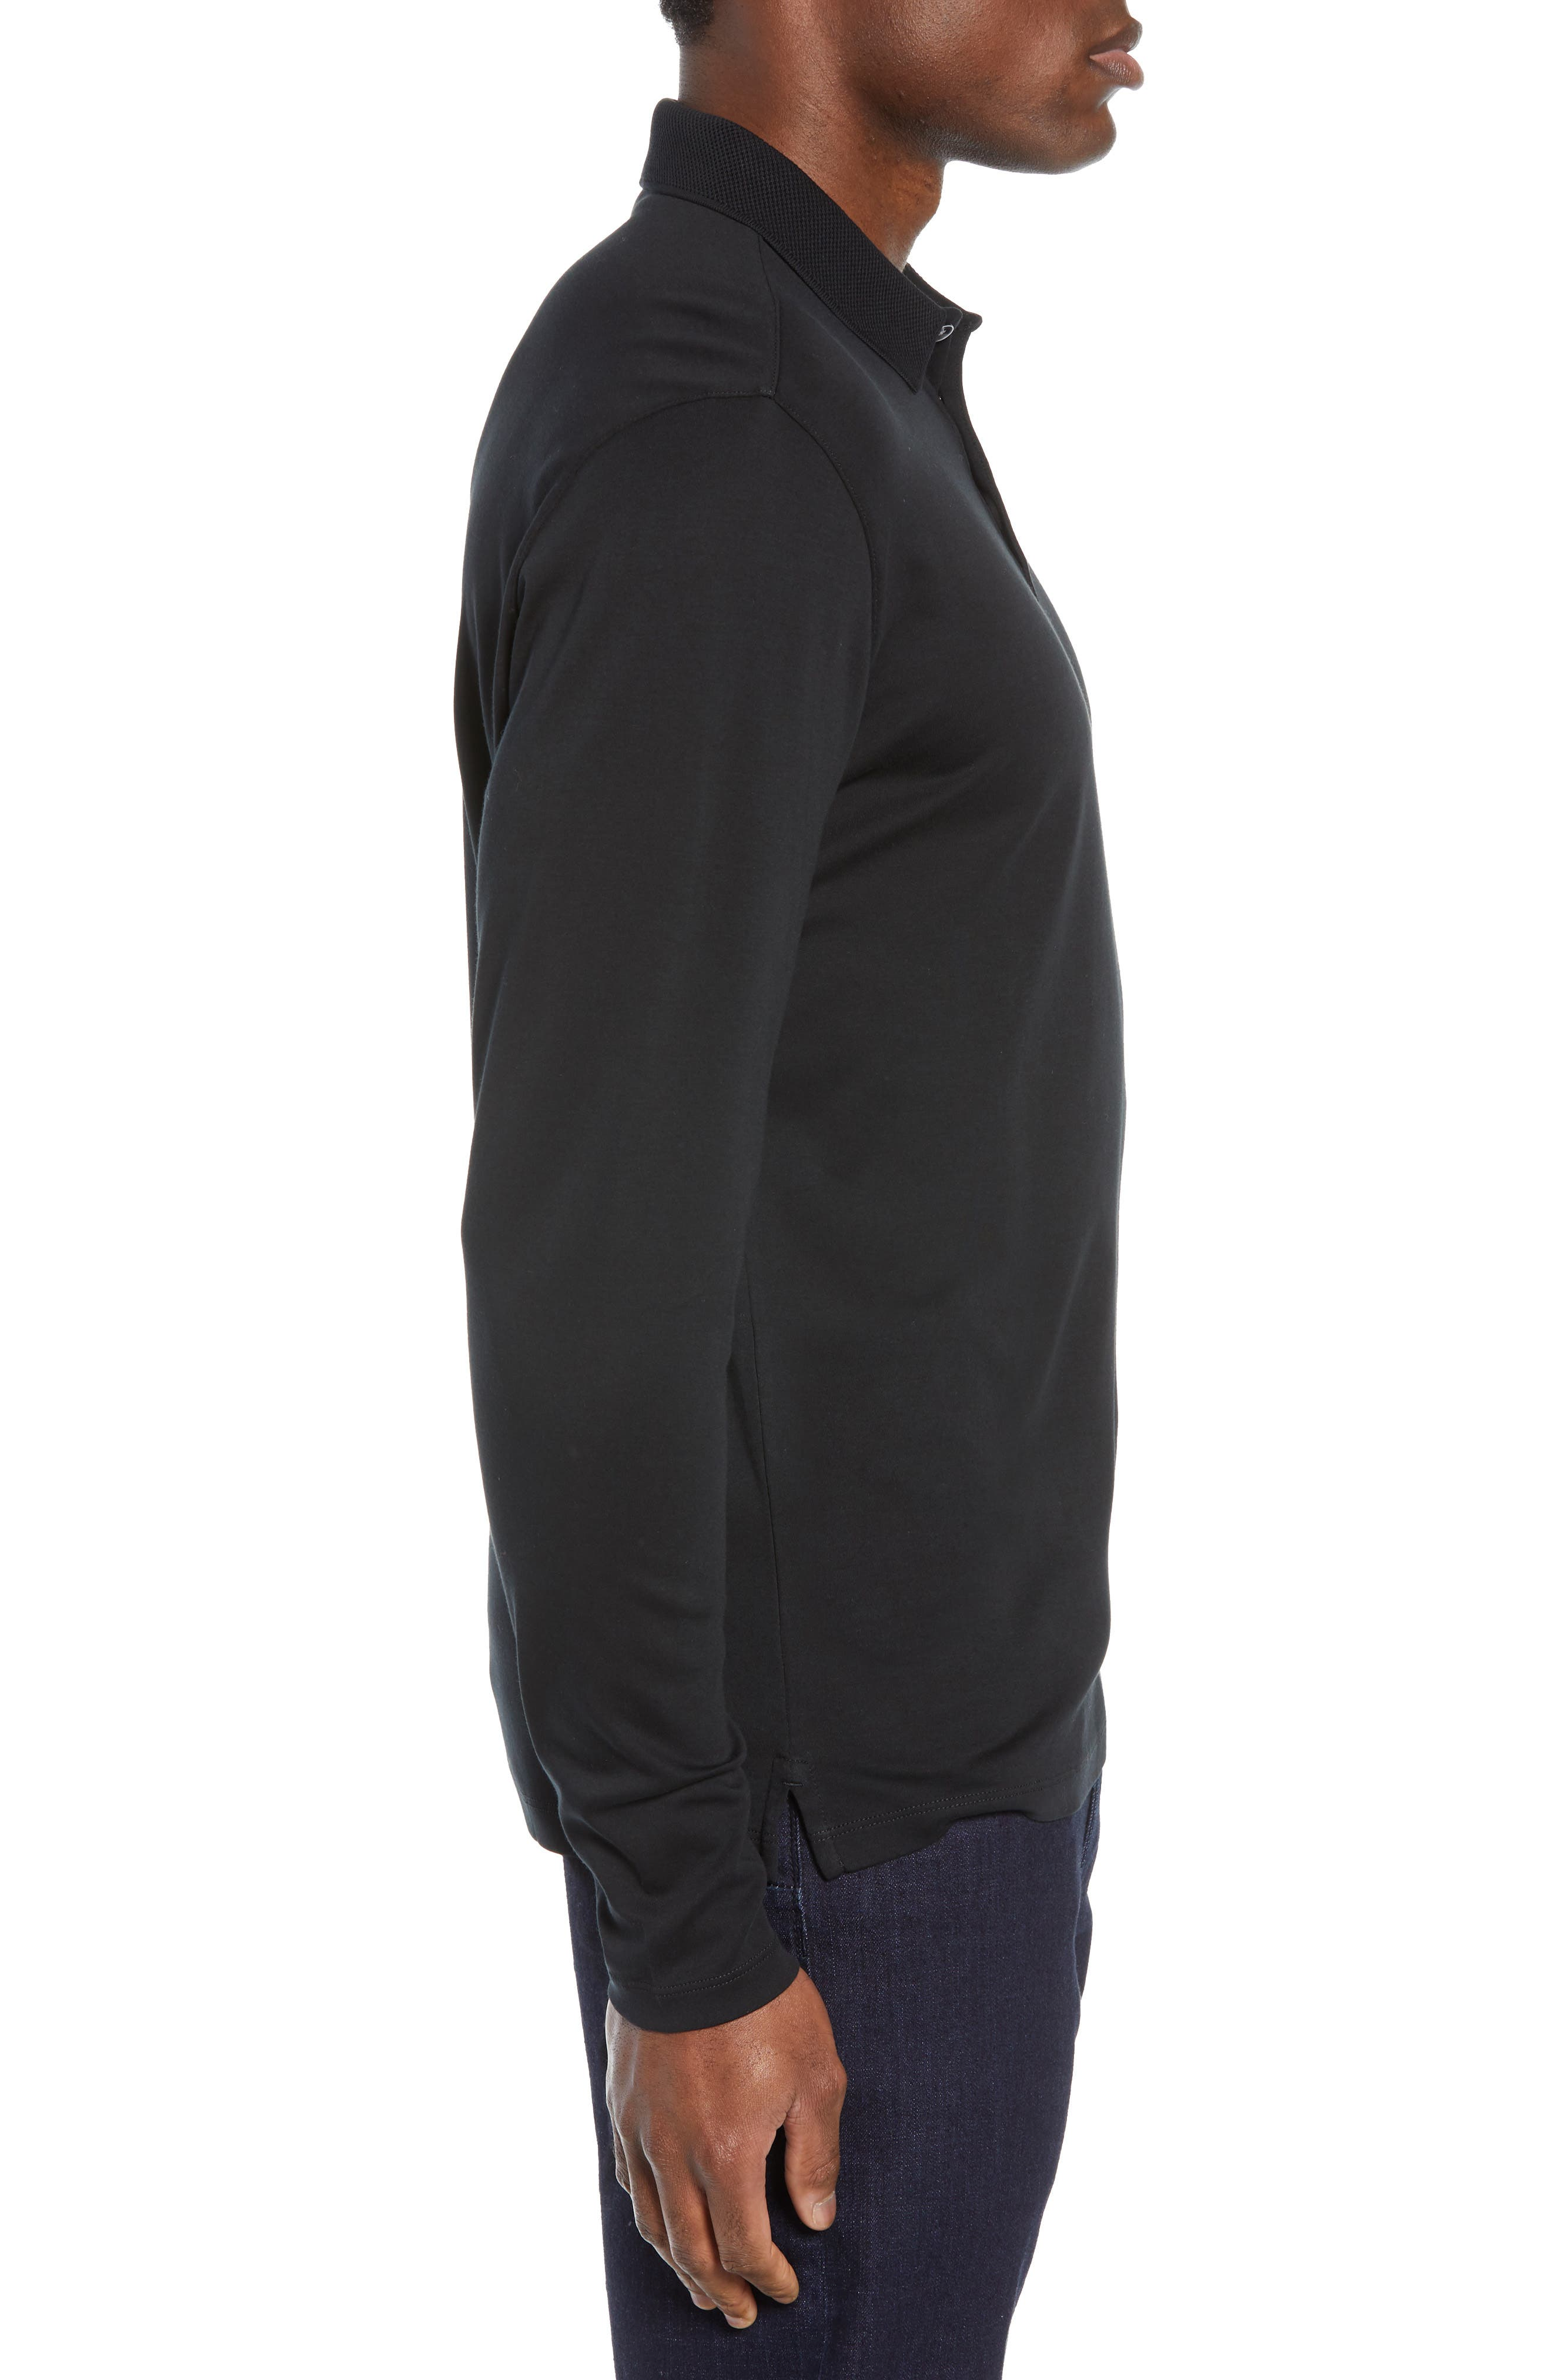 ROBERT BARAKETT, Batiste Long Sleeve Polo, Alternate thumbnail 3, color, BLACK